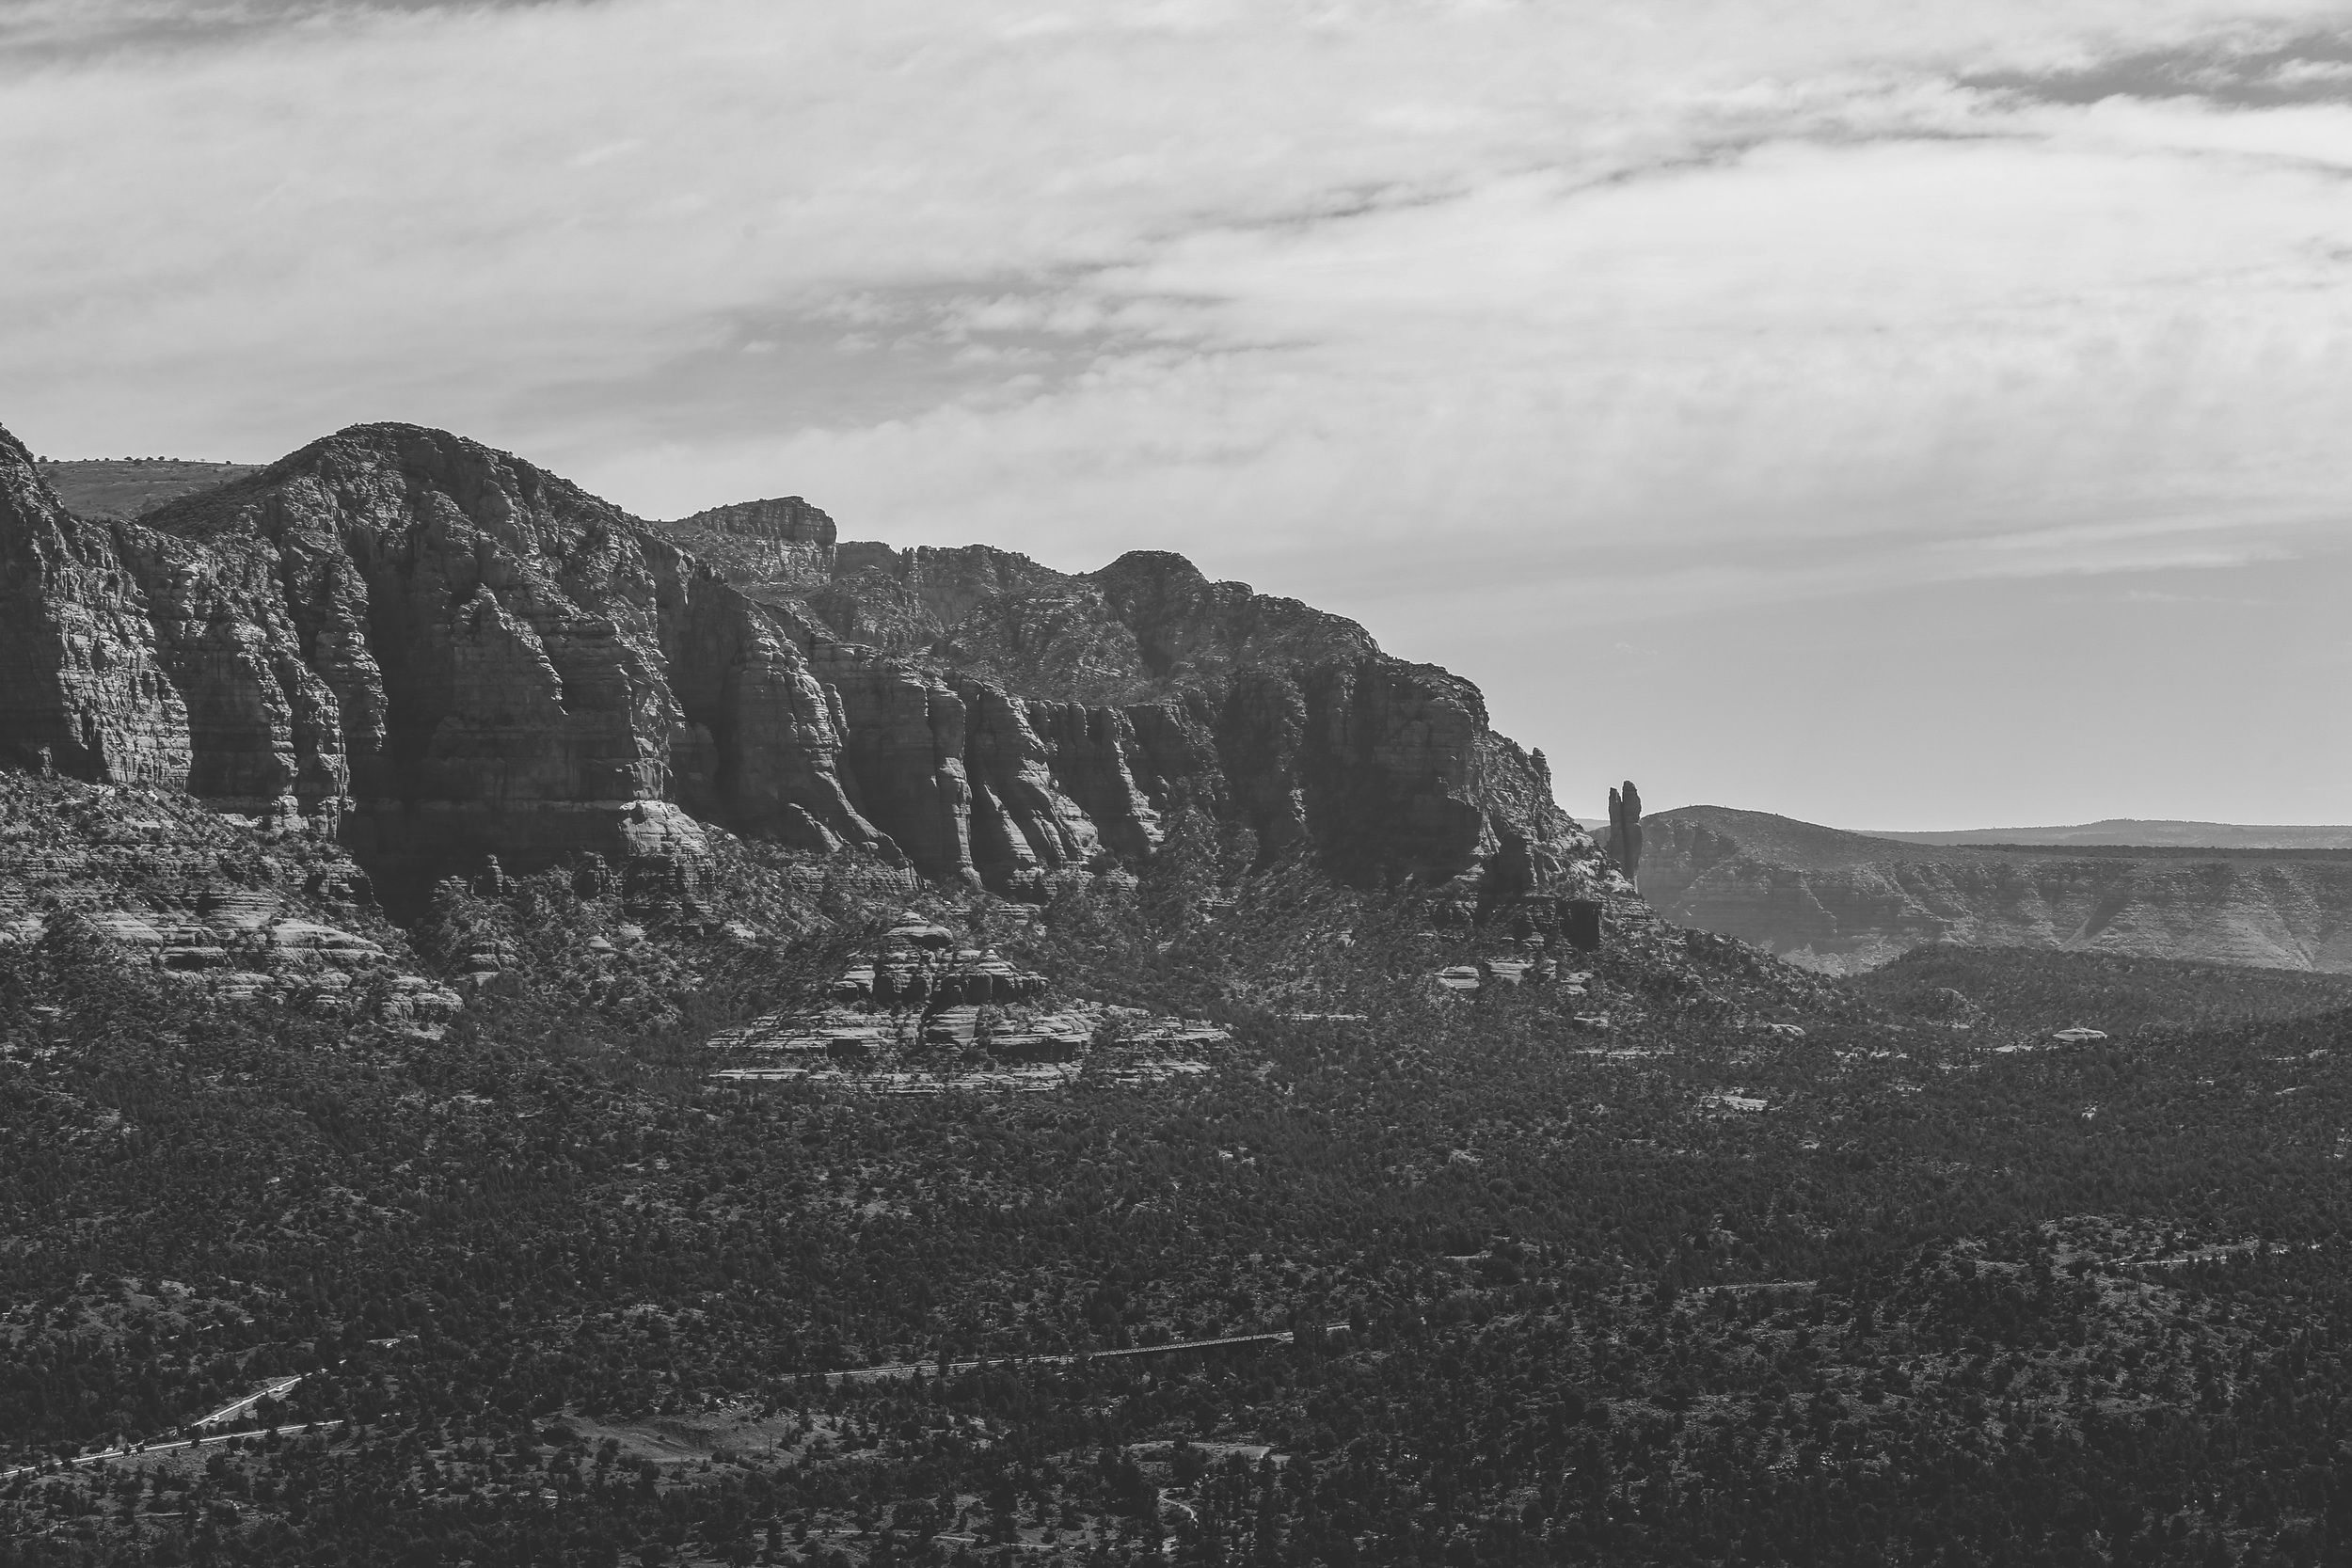 Honeymoon_Arizona_JonCourvillePhotography-5.jpg